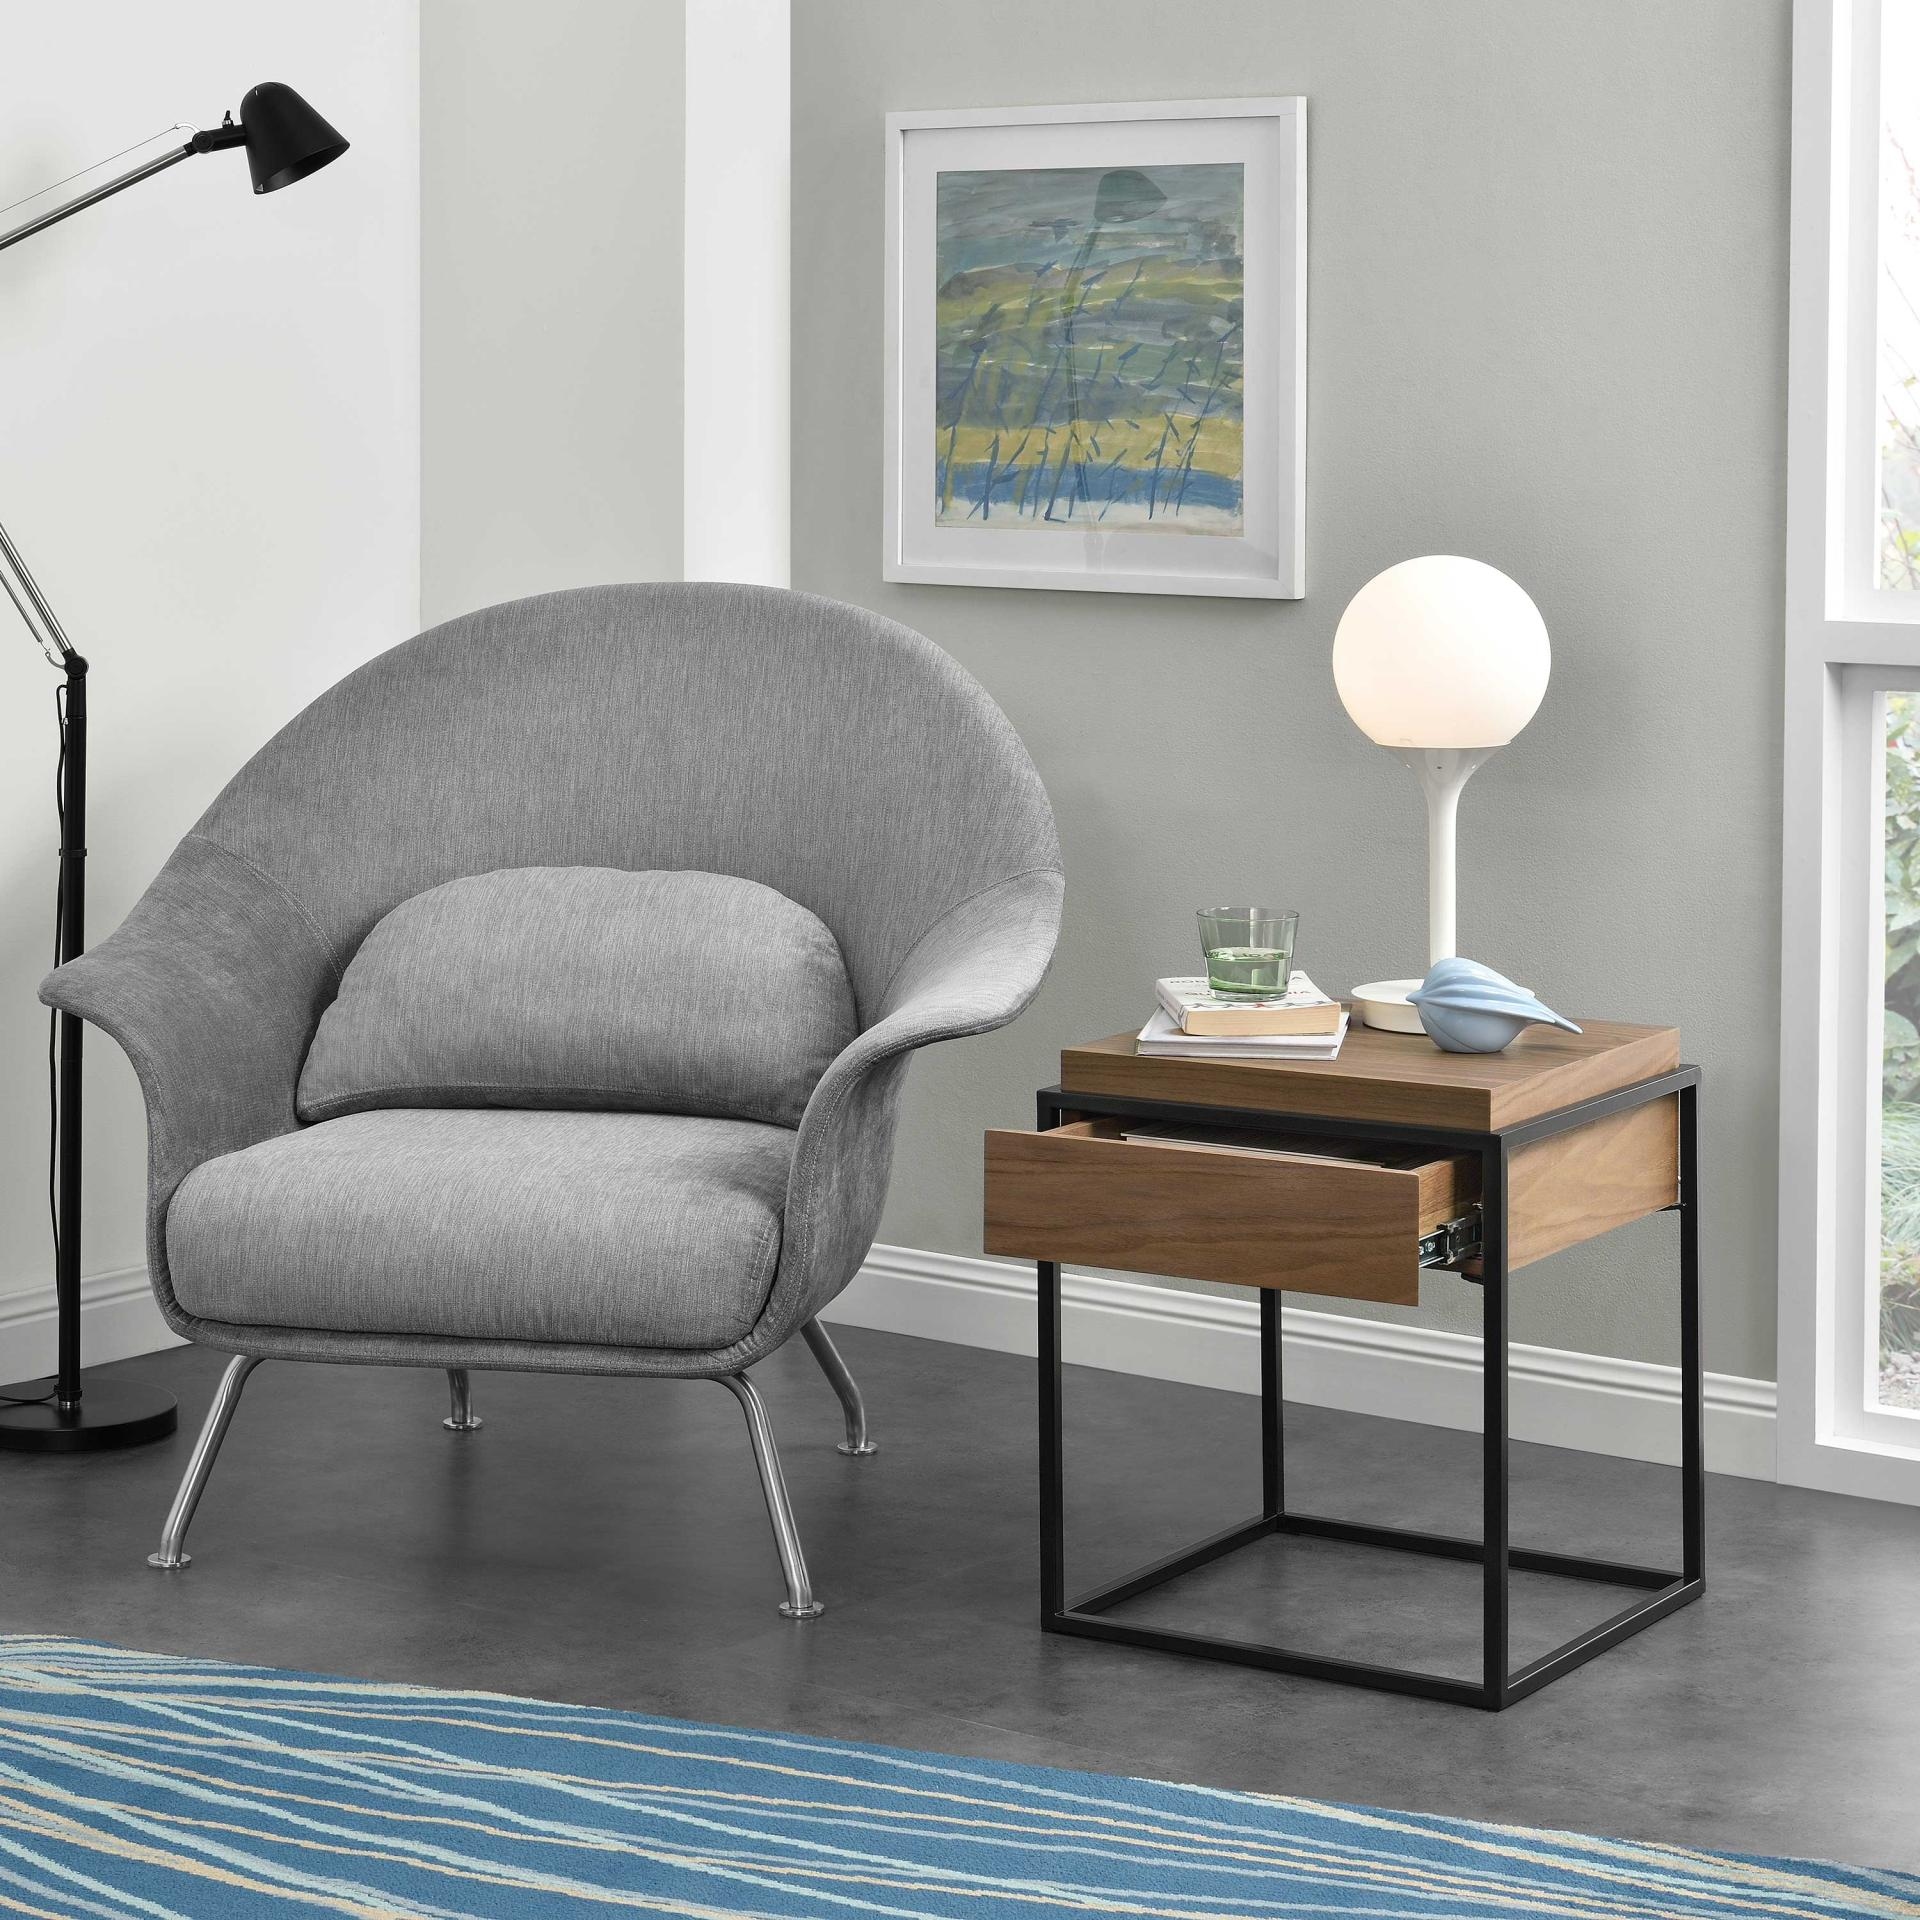 1030005 Npd Home Furniture Wholesale Lifestyle Furnishings